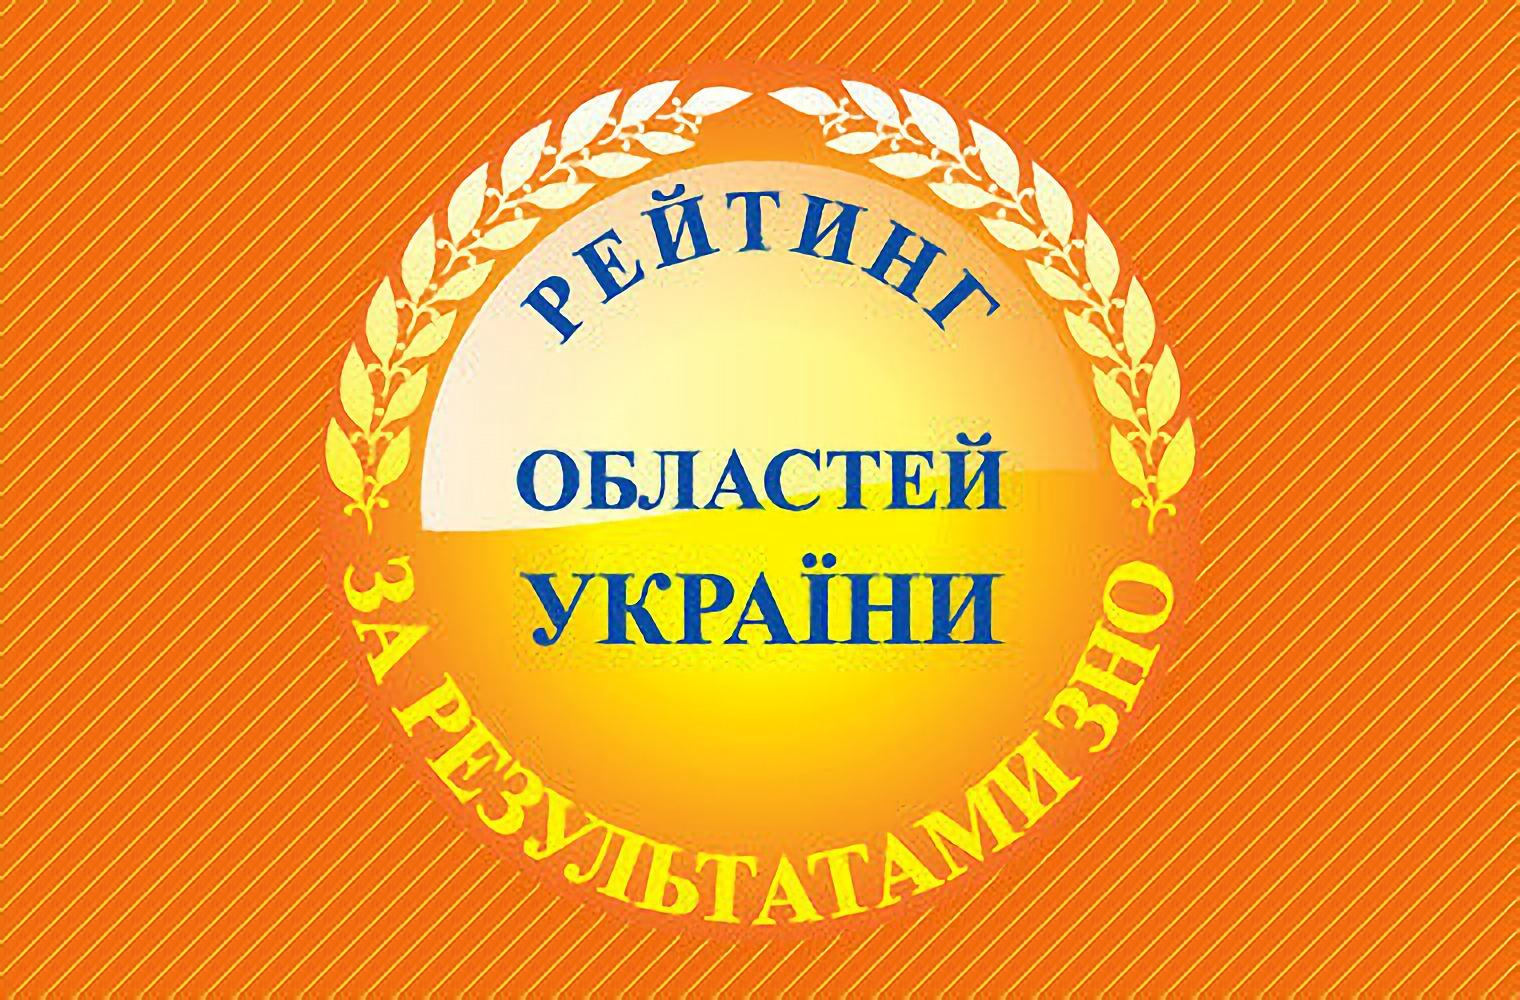 Черкащина – десята в освітньому рейтингу України